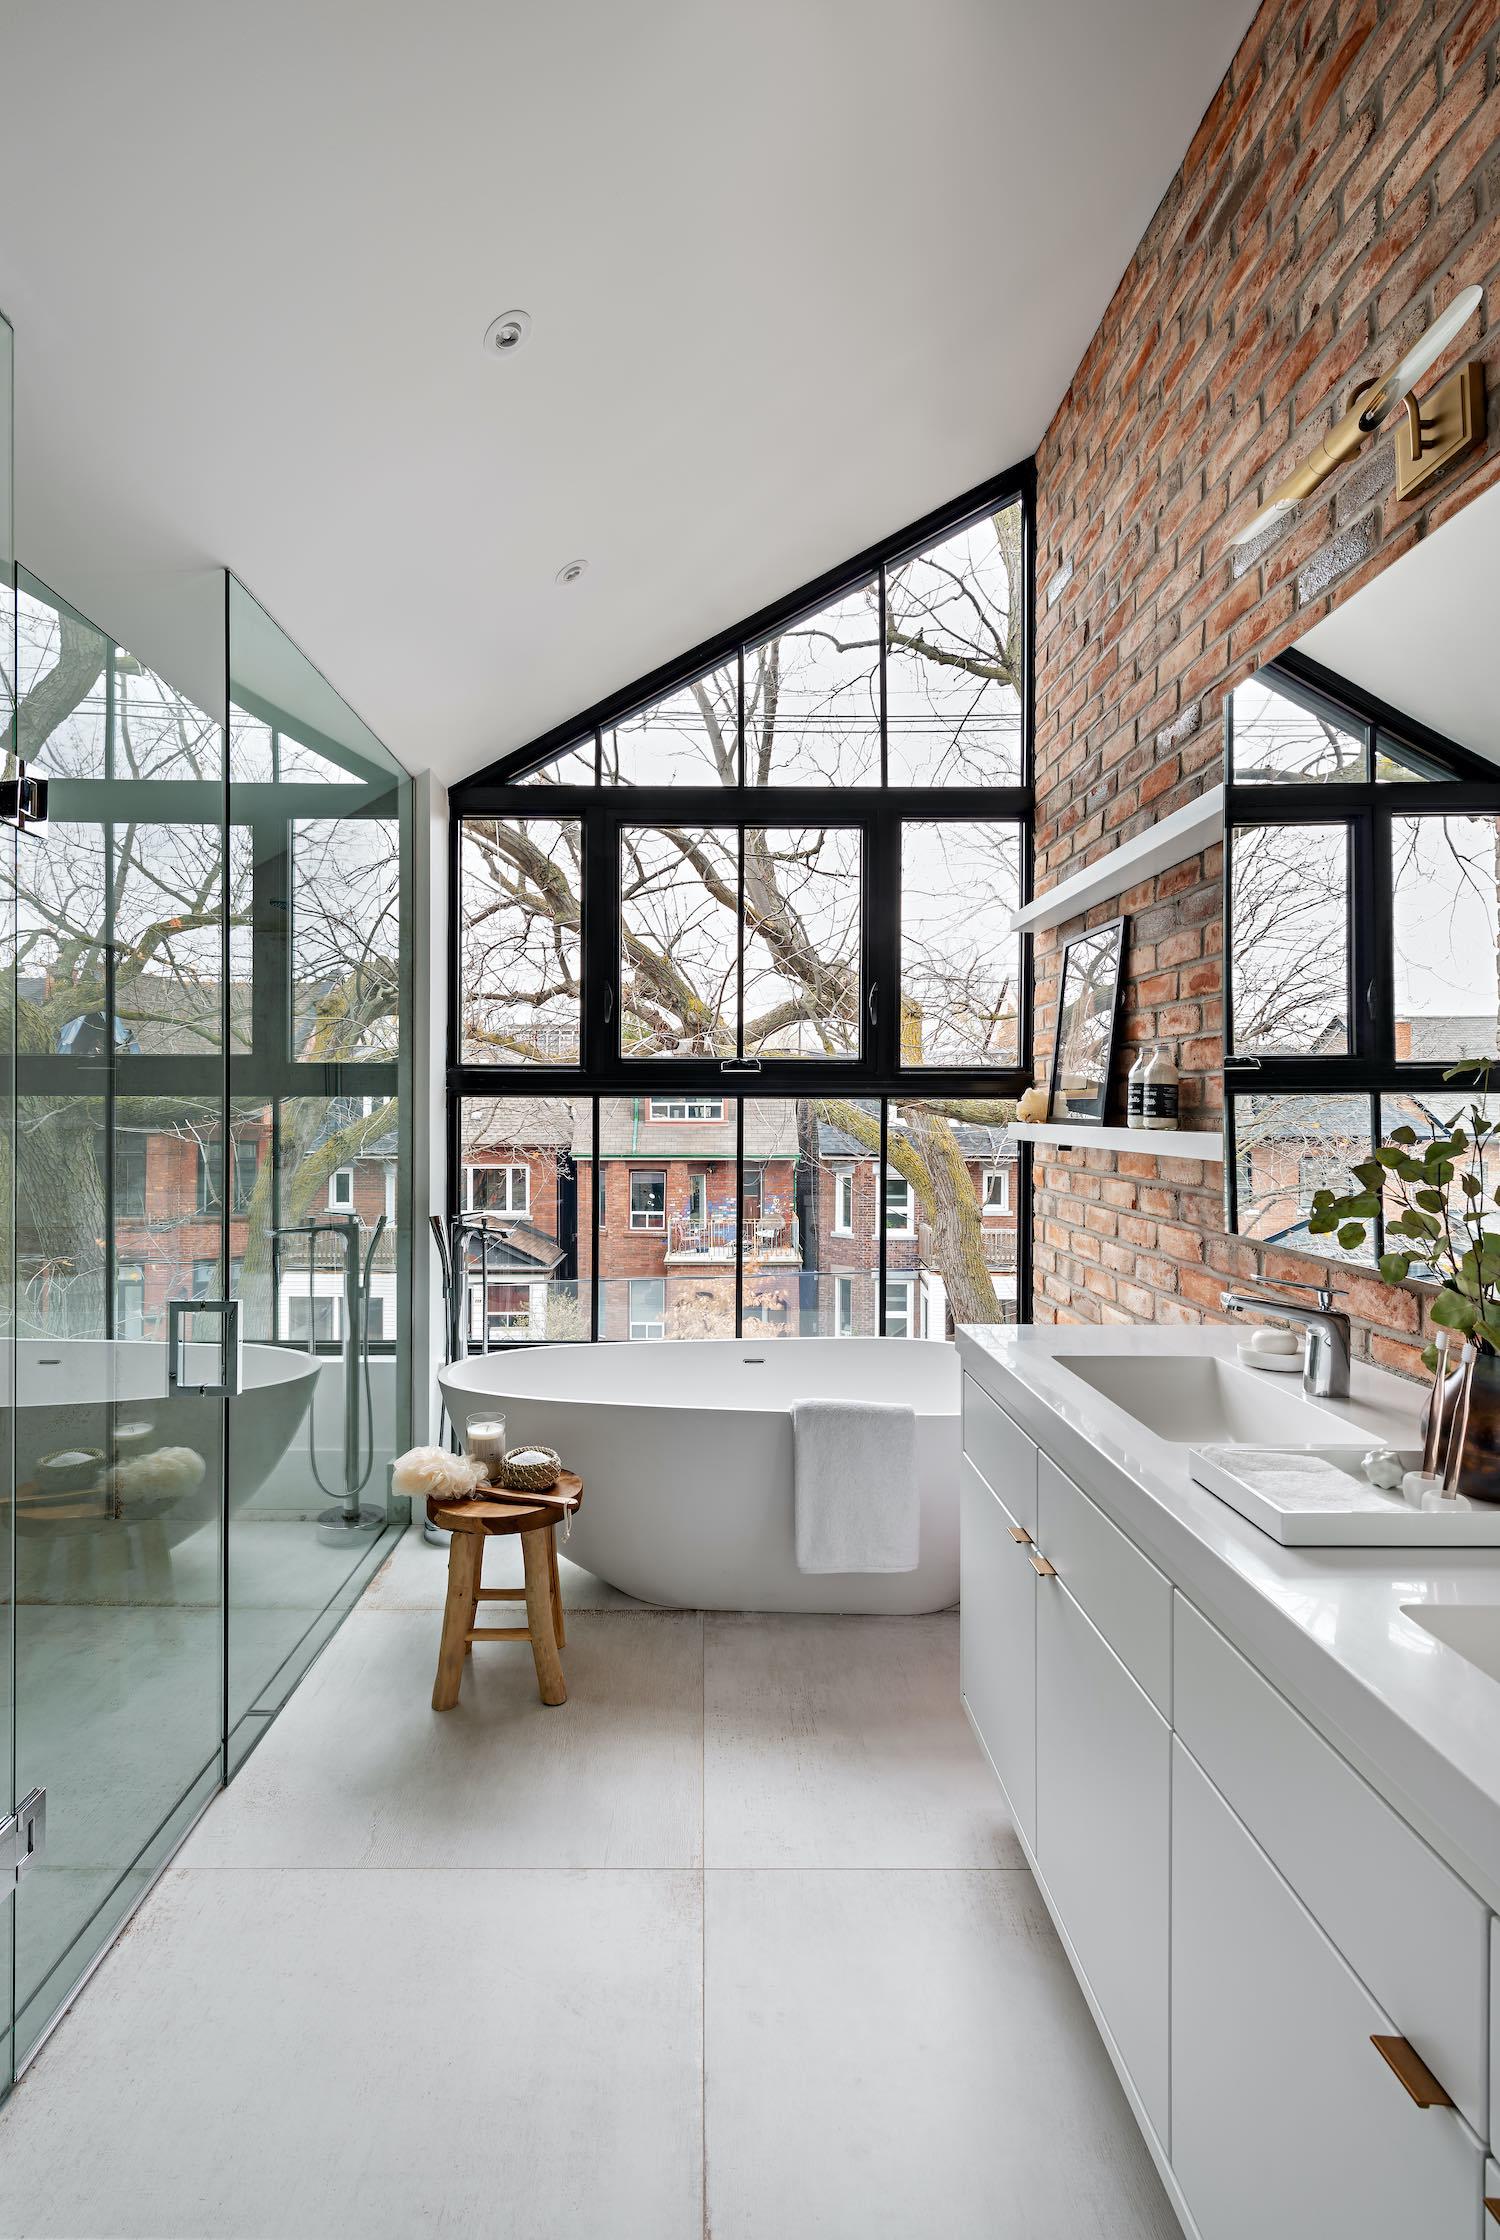 bathtub nearby window with a great city view